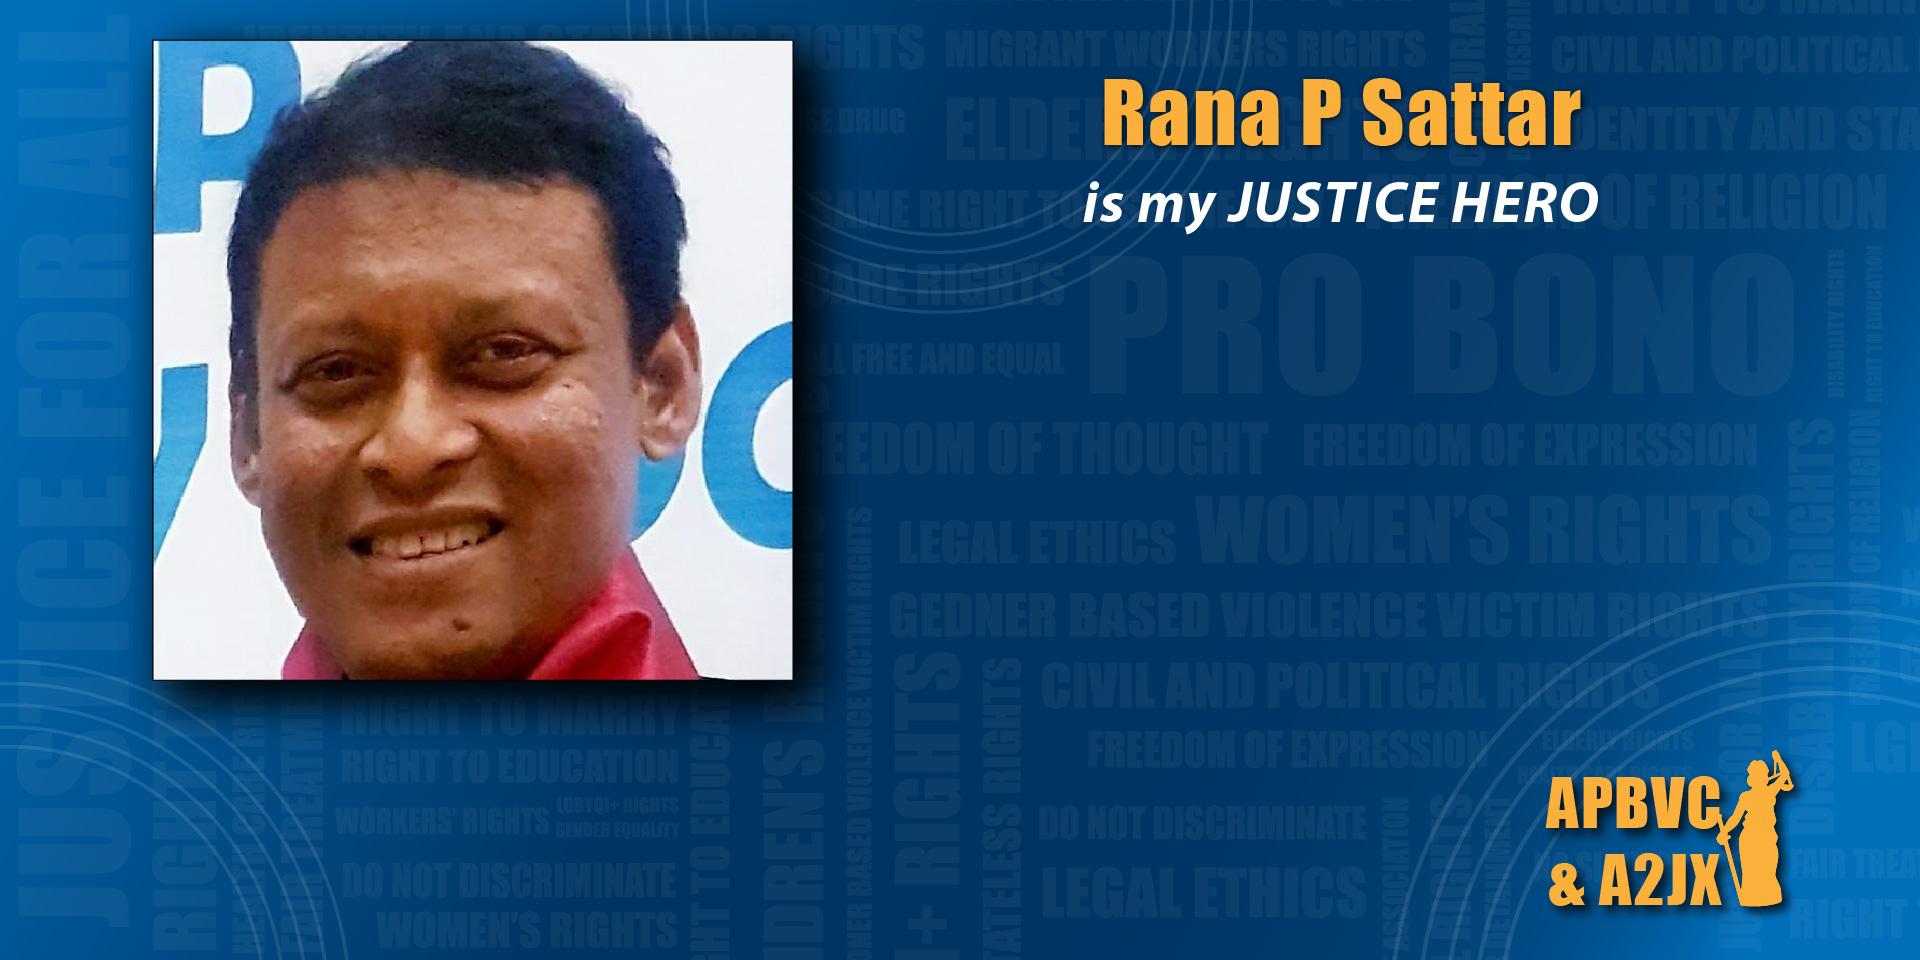 Rana P Sattar